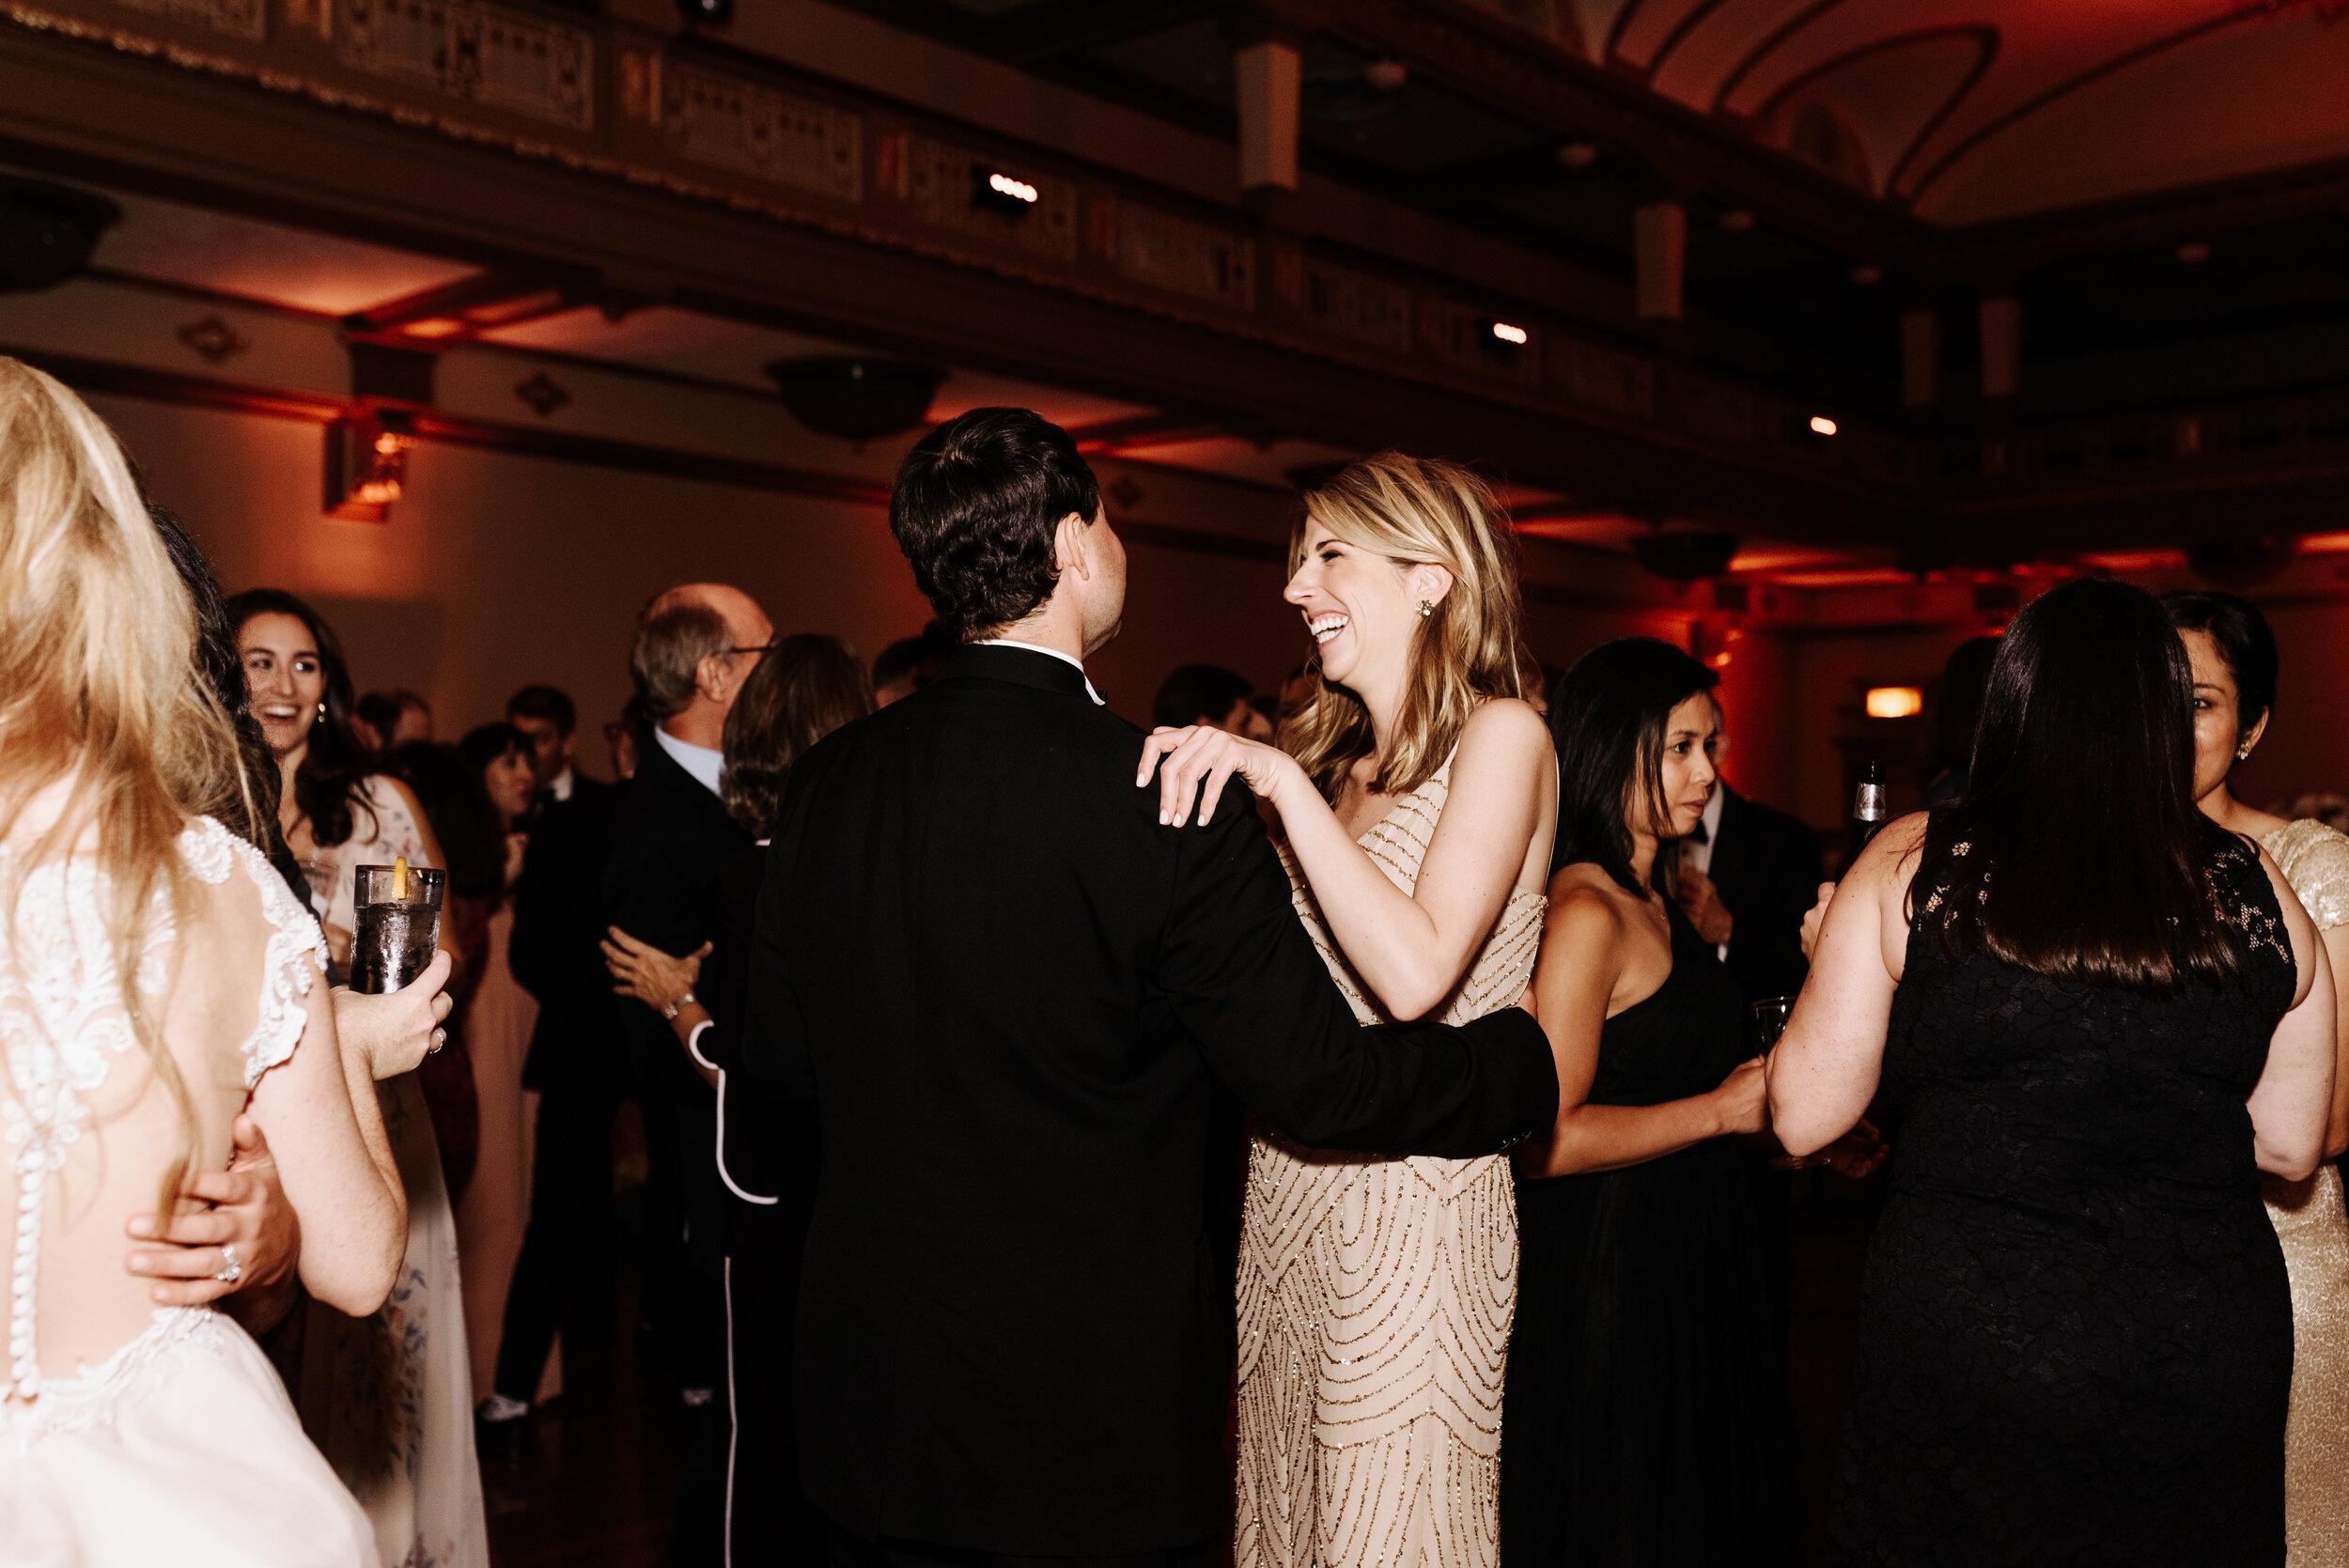 Cassie-Mrunal-Wedding-Quirk-Hotel-John-Marshall-Ballrooms-Richmond-Virginia-Photography-by-V-105.jpg